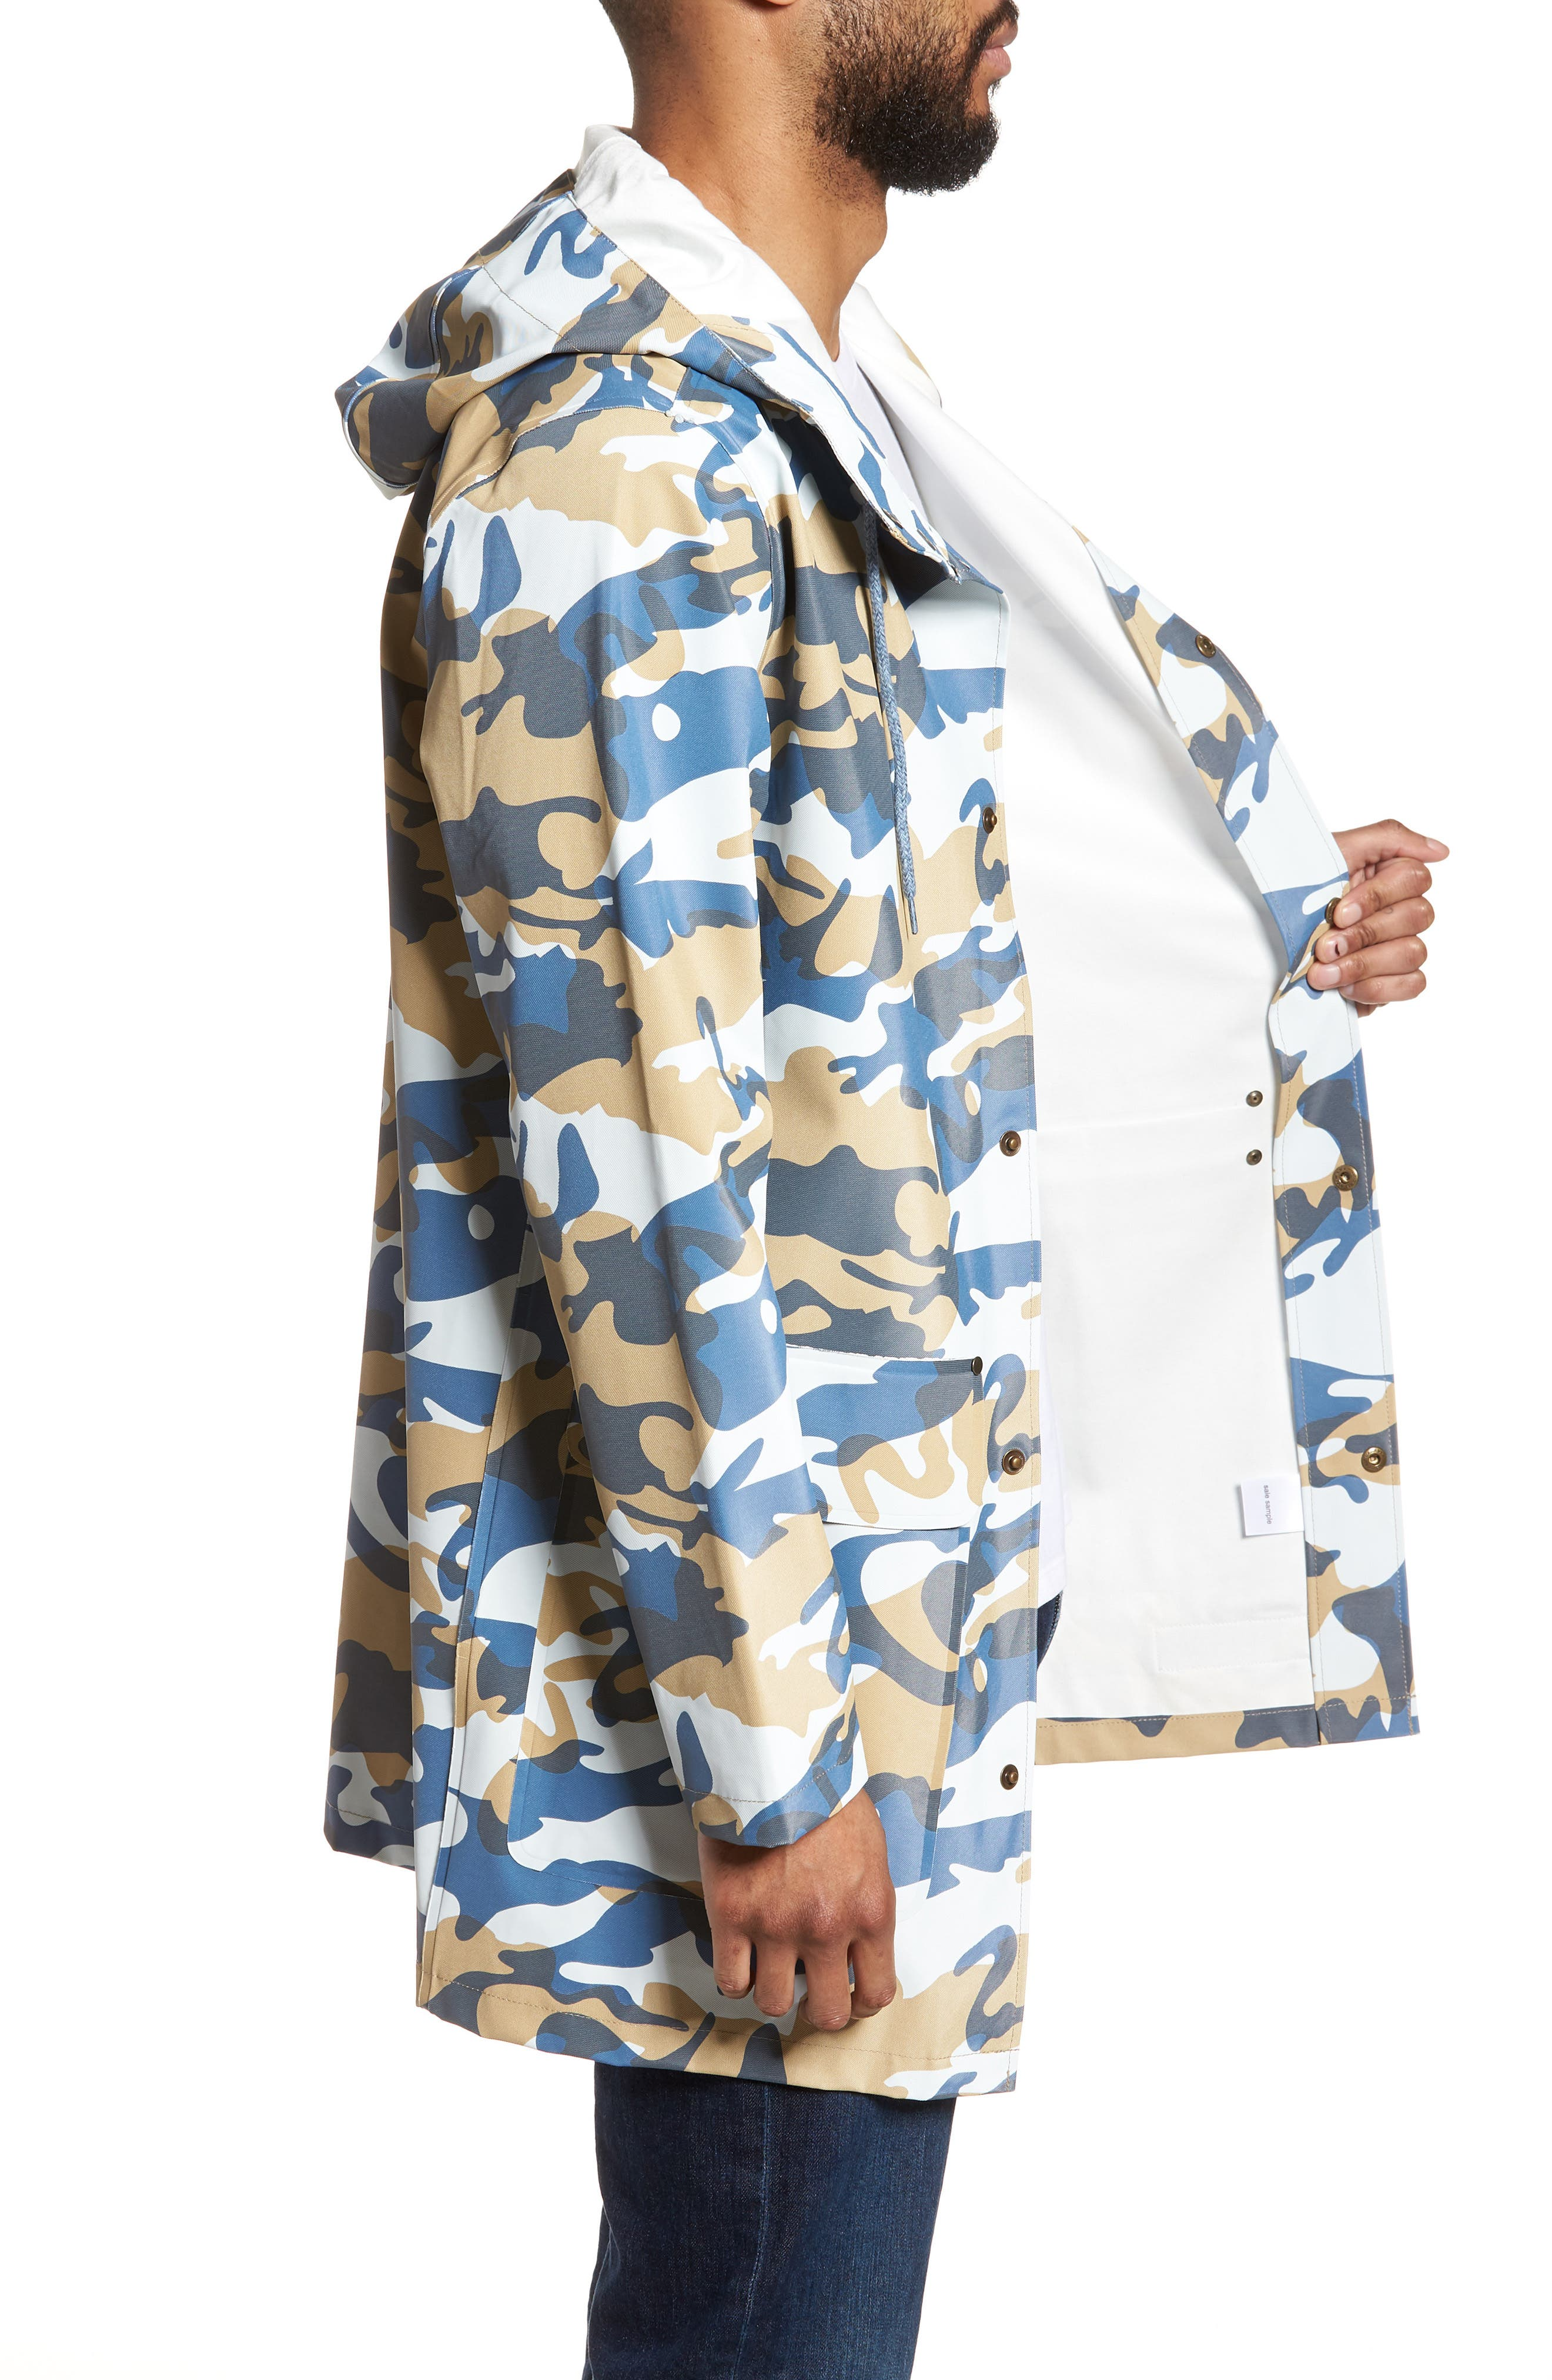 Stockholm Waterproof Hooded Raincoat,                             Alternate thumbnail 3, color,                             Camo